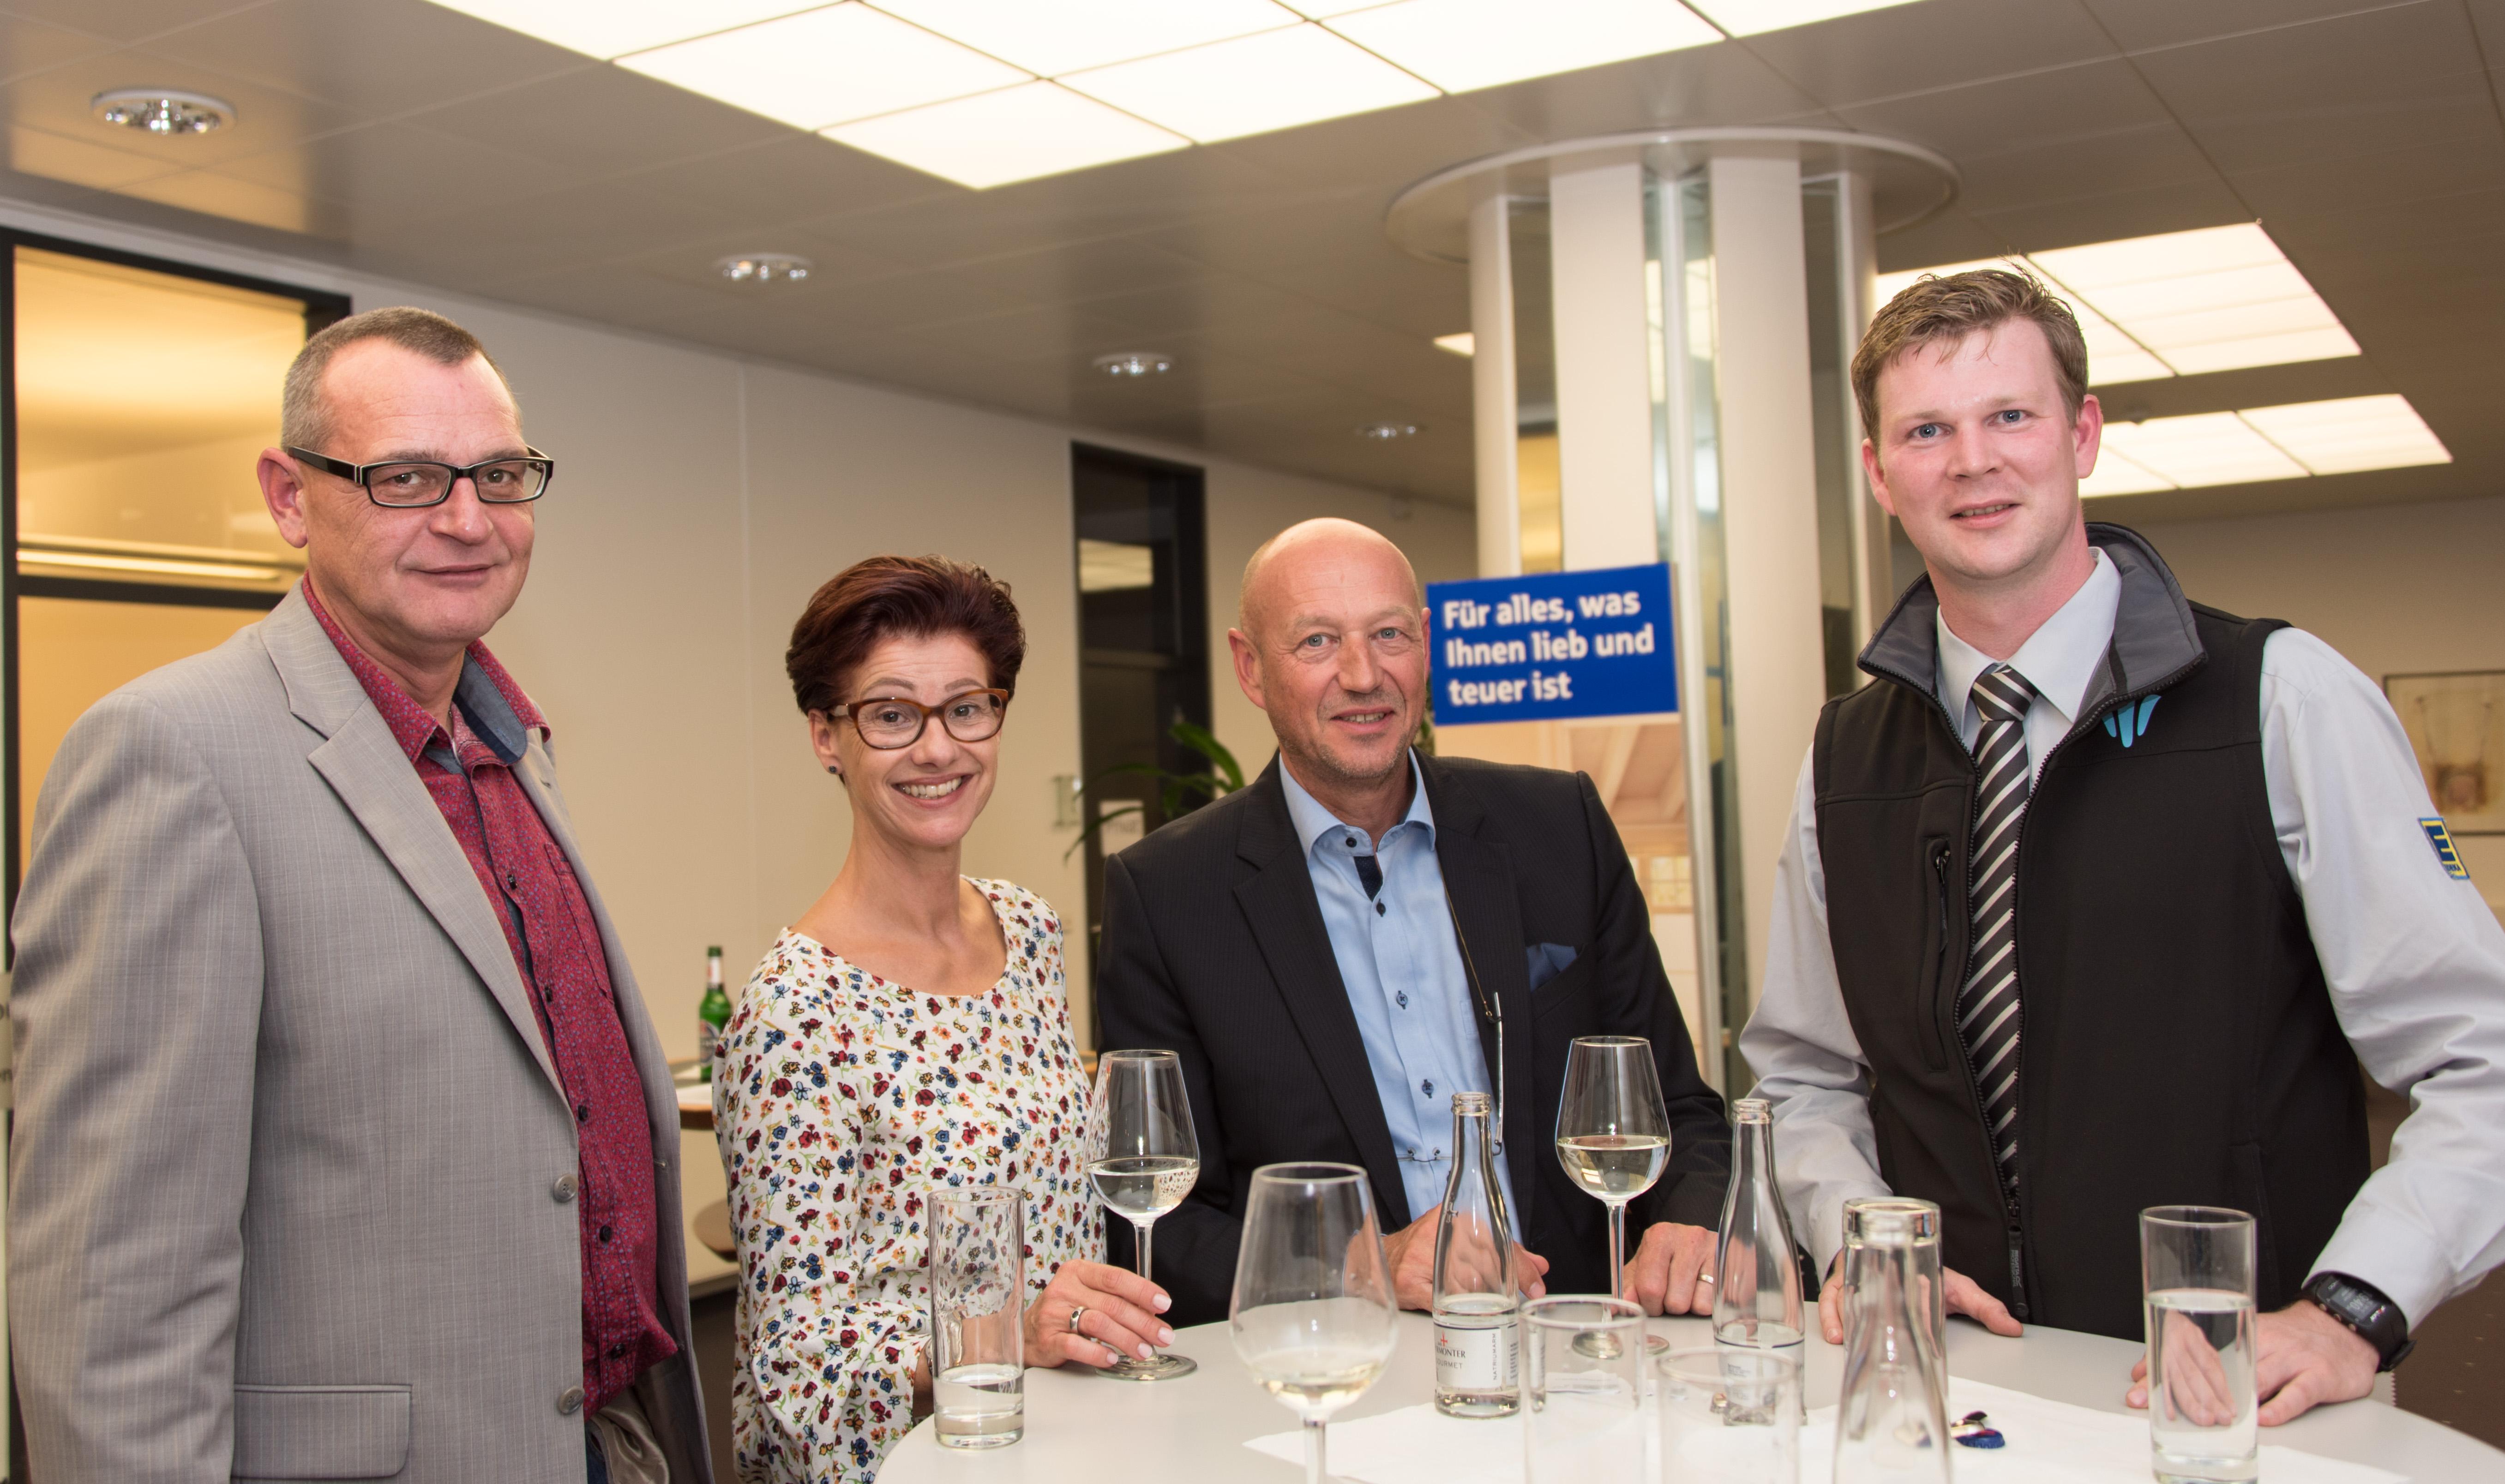 vl. Thorsten Heinrich, Petra Gehle, Rolf Gehle, Sebastian Cramer